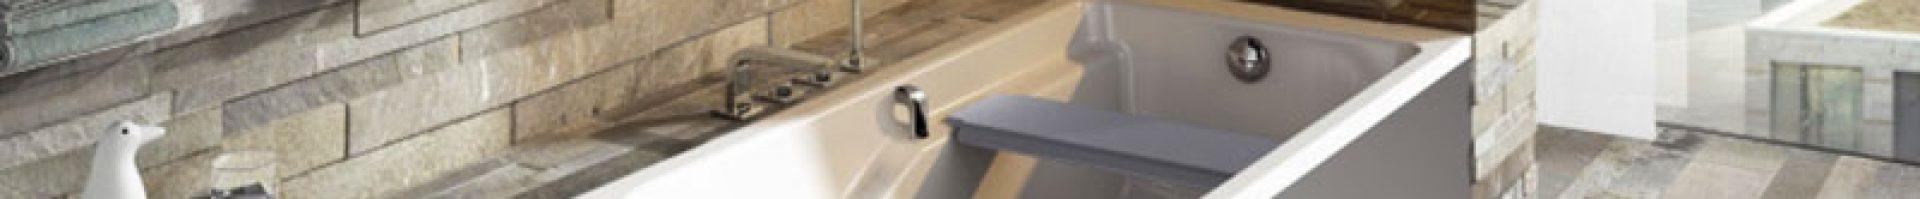 Heizung Sanitr Solar  pipetec  Ihr Klempner in Leipzig